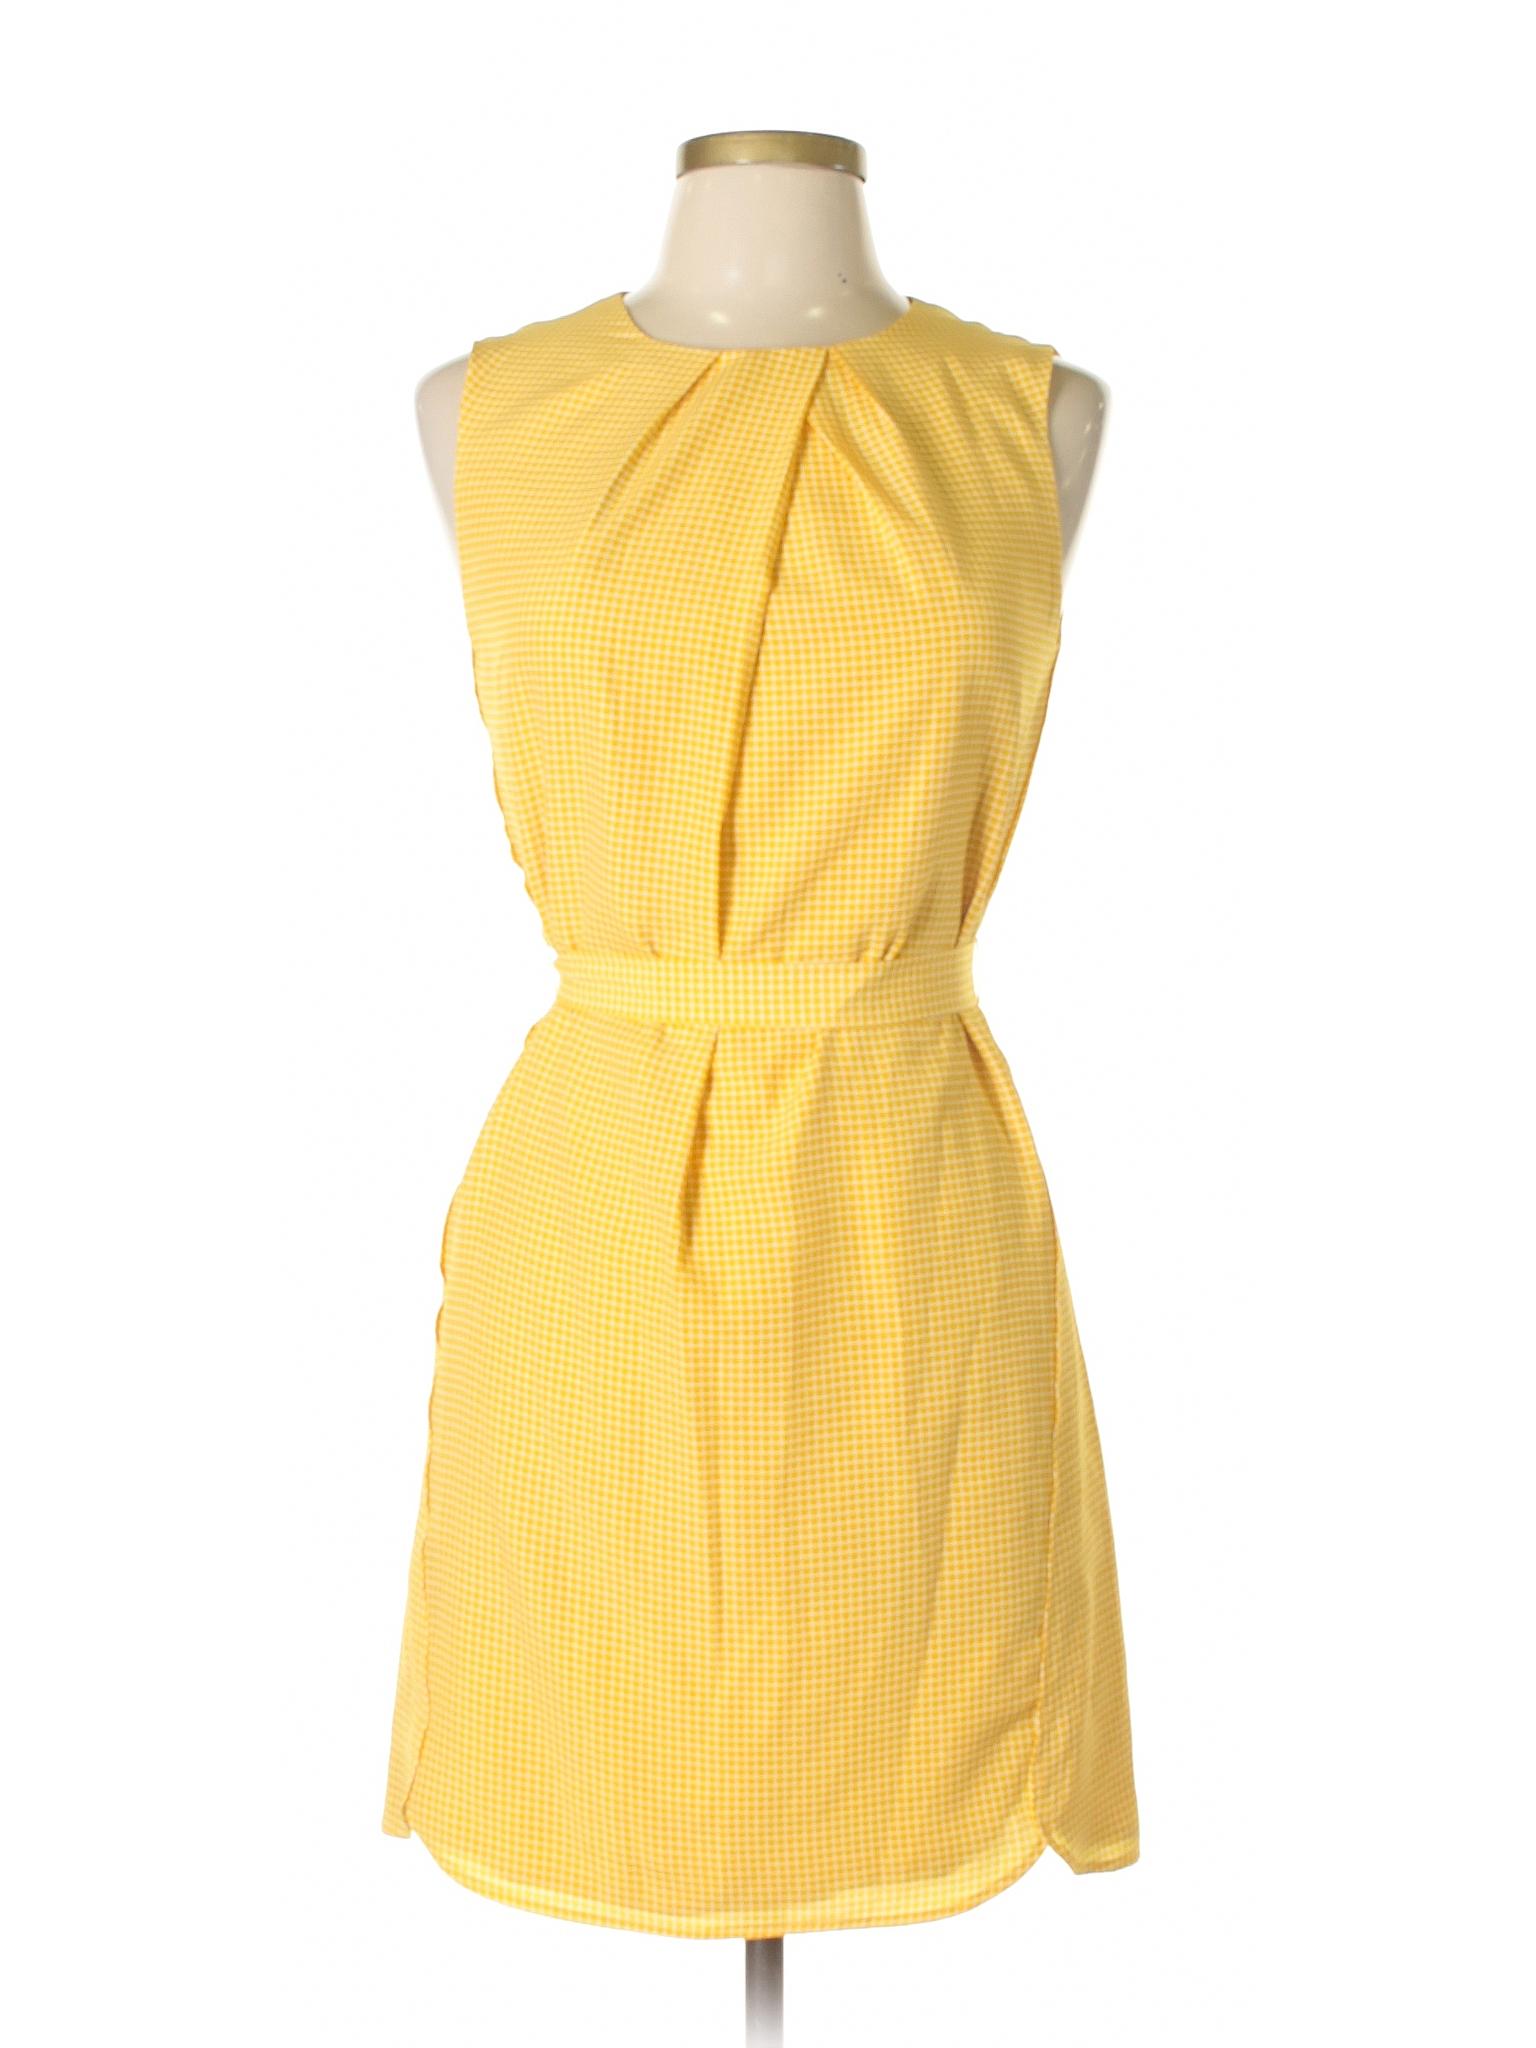 Taylor winter Ann Dress Casual Boutique qTFEfxwSy